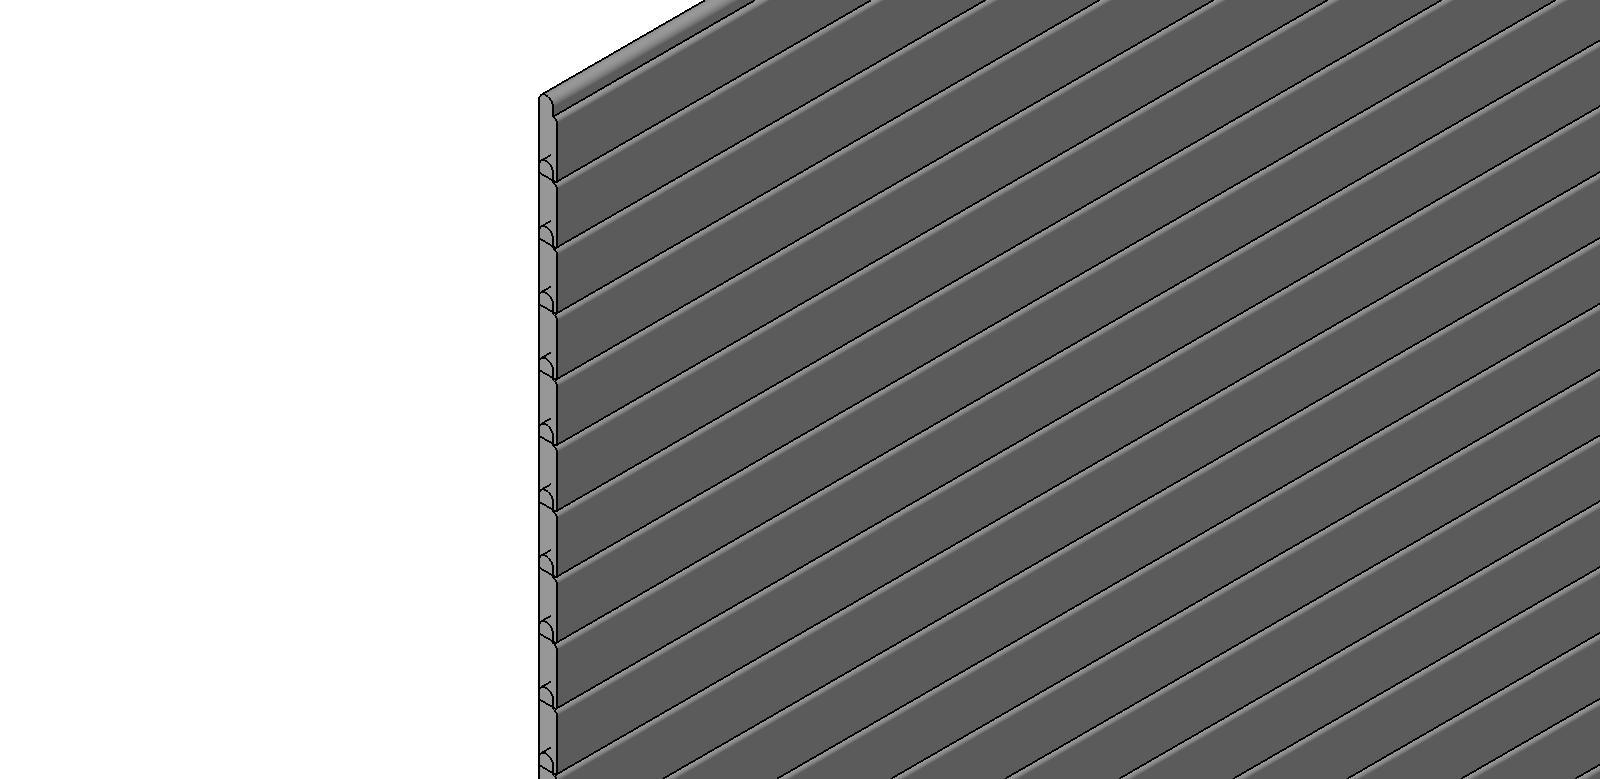 Overhead Doors Slat Doors Flat - 20625  sc 1 st  BIM Objects / Families & BIM Objects / Families